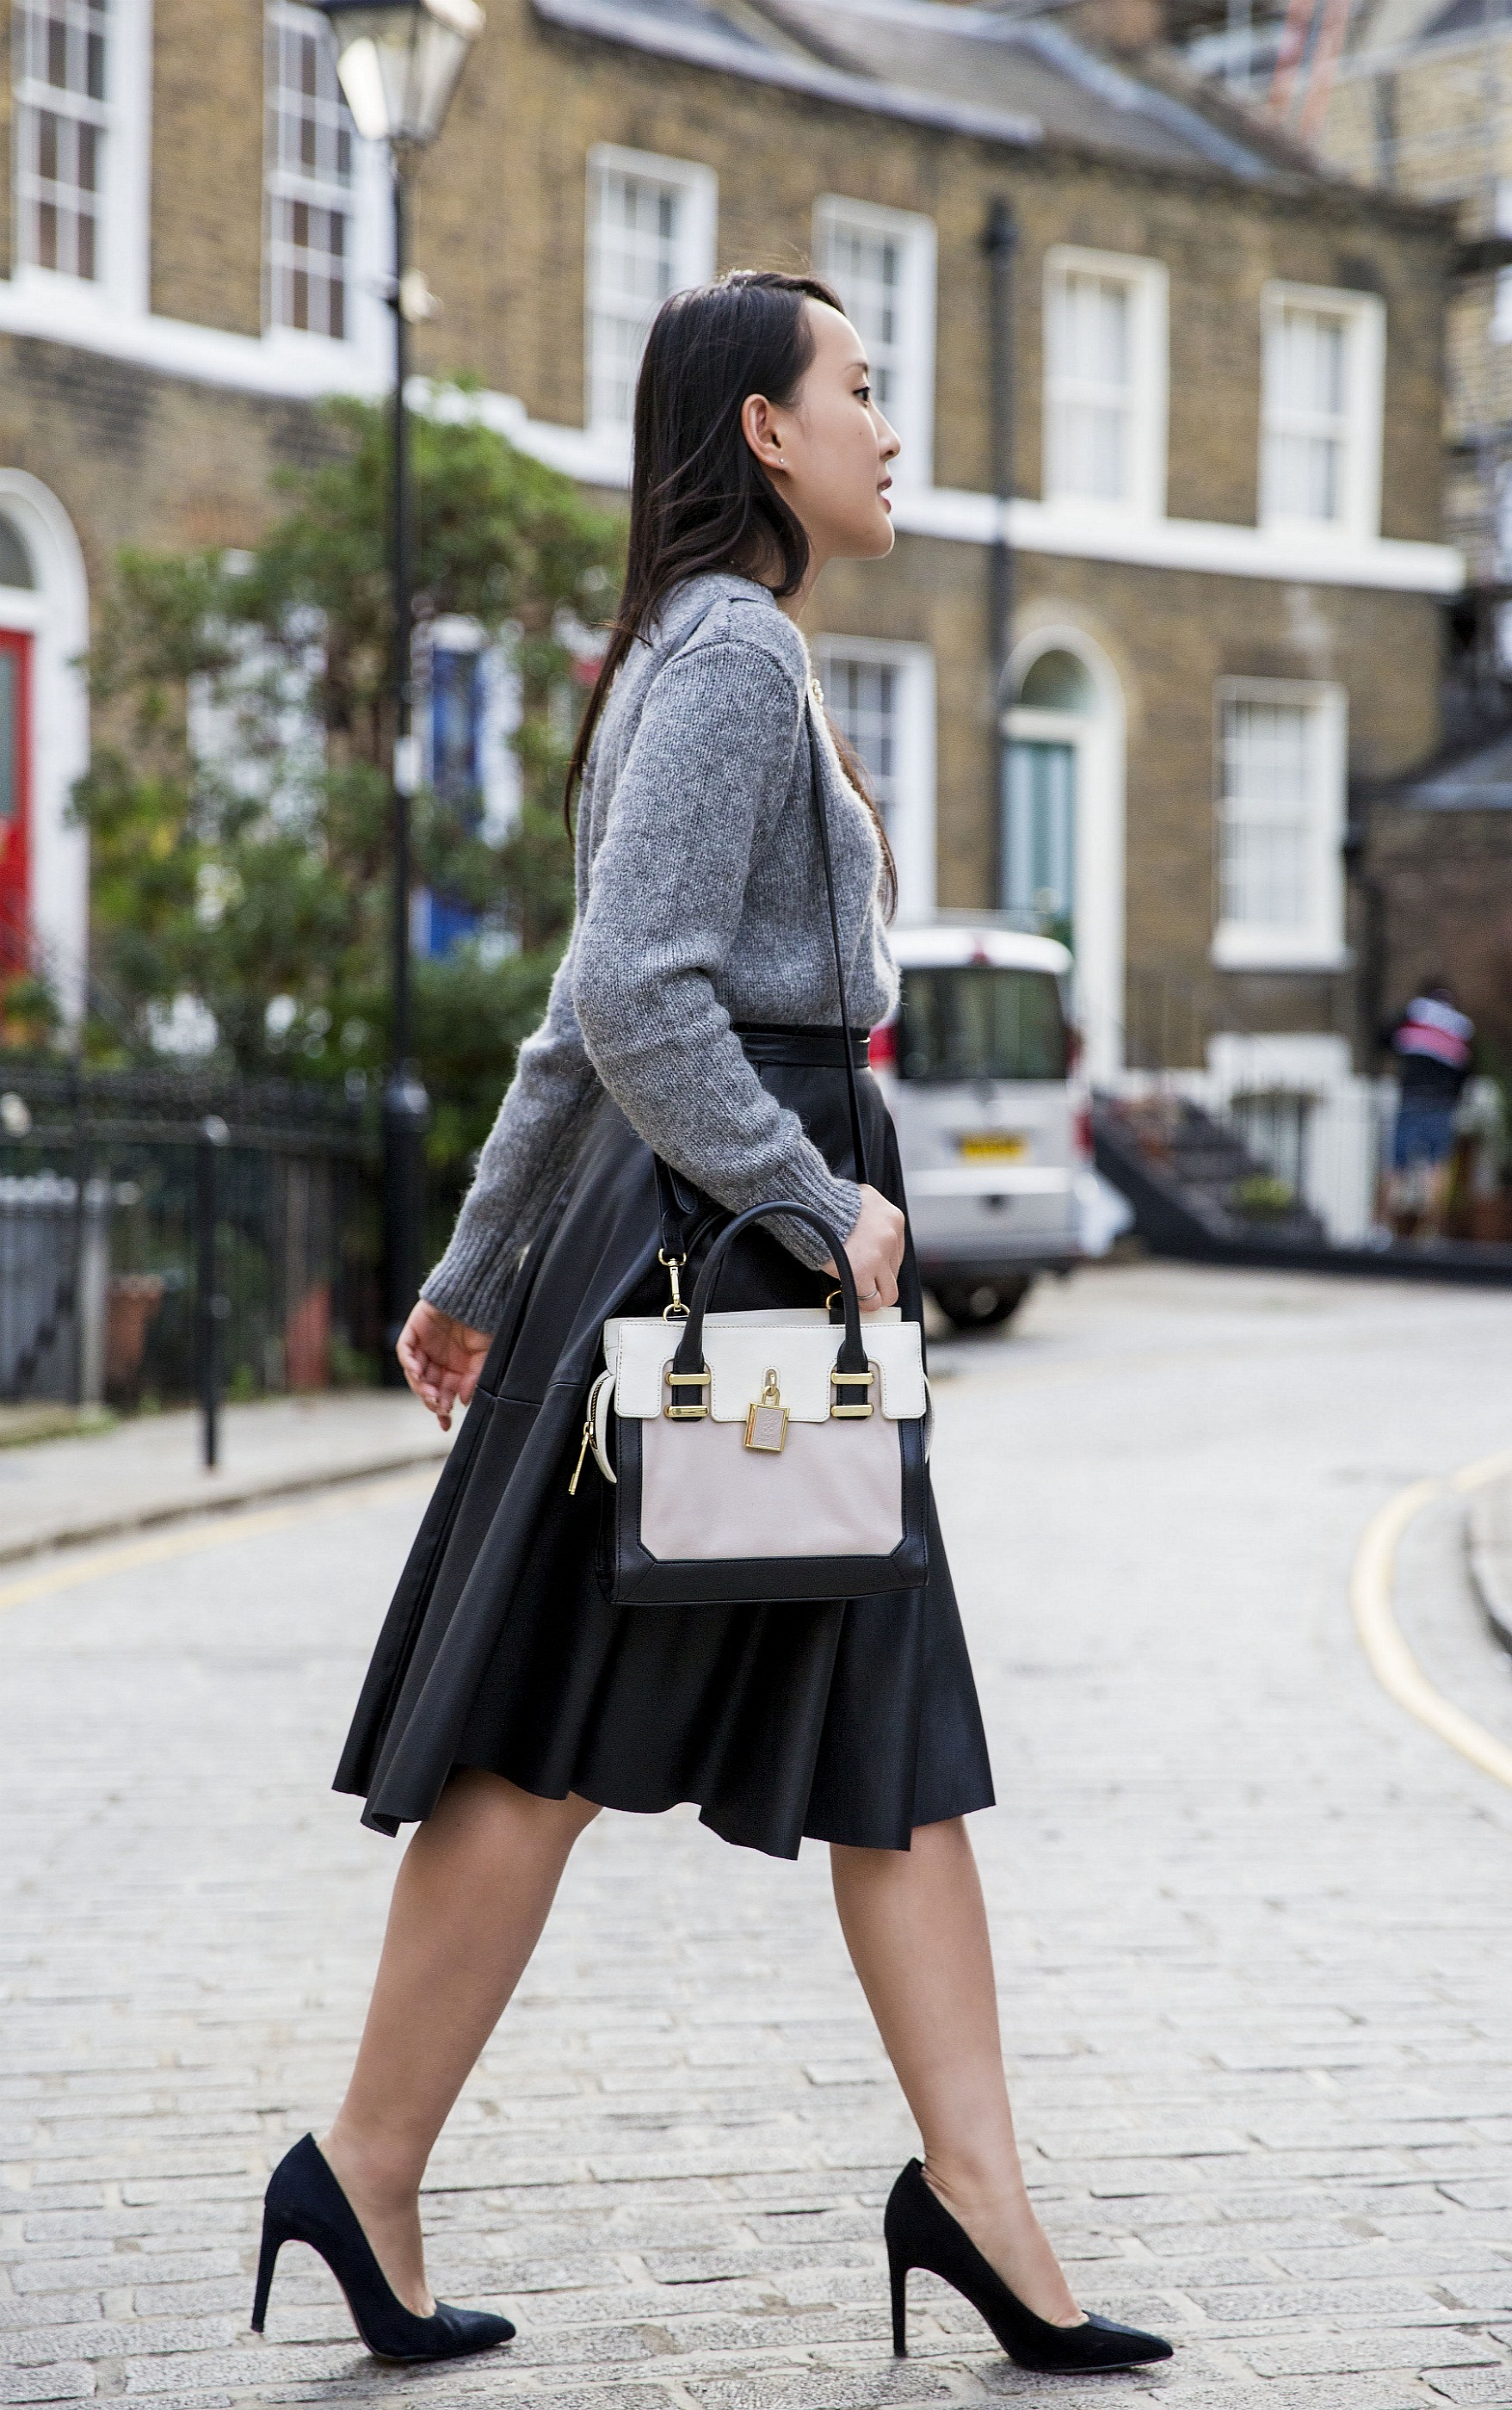 51d0b3a579 Fall Lookbook: The Leather Midi | Areta's Style Secrets